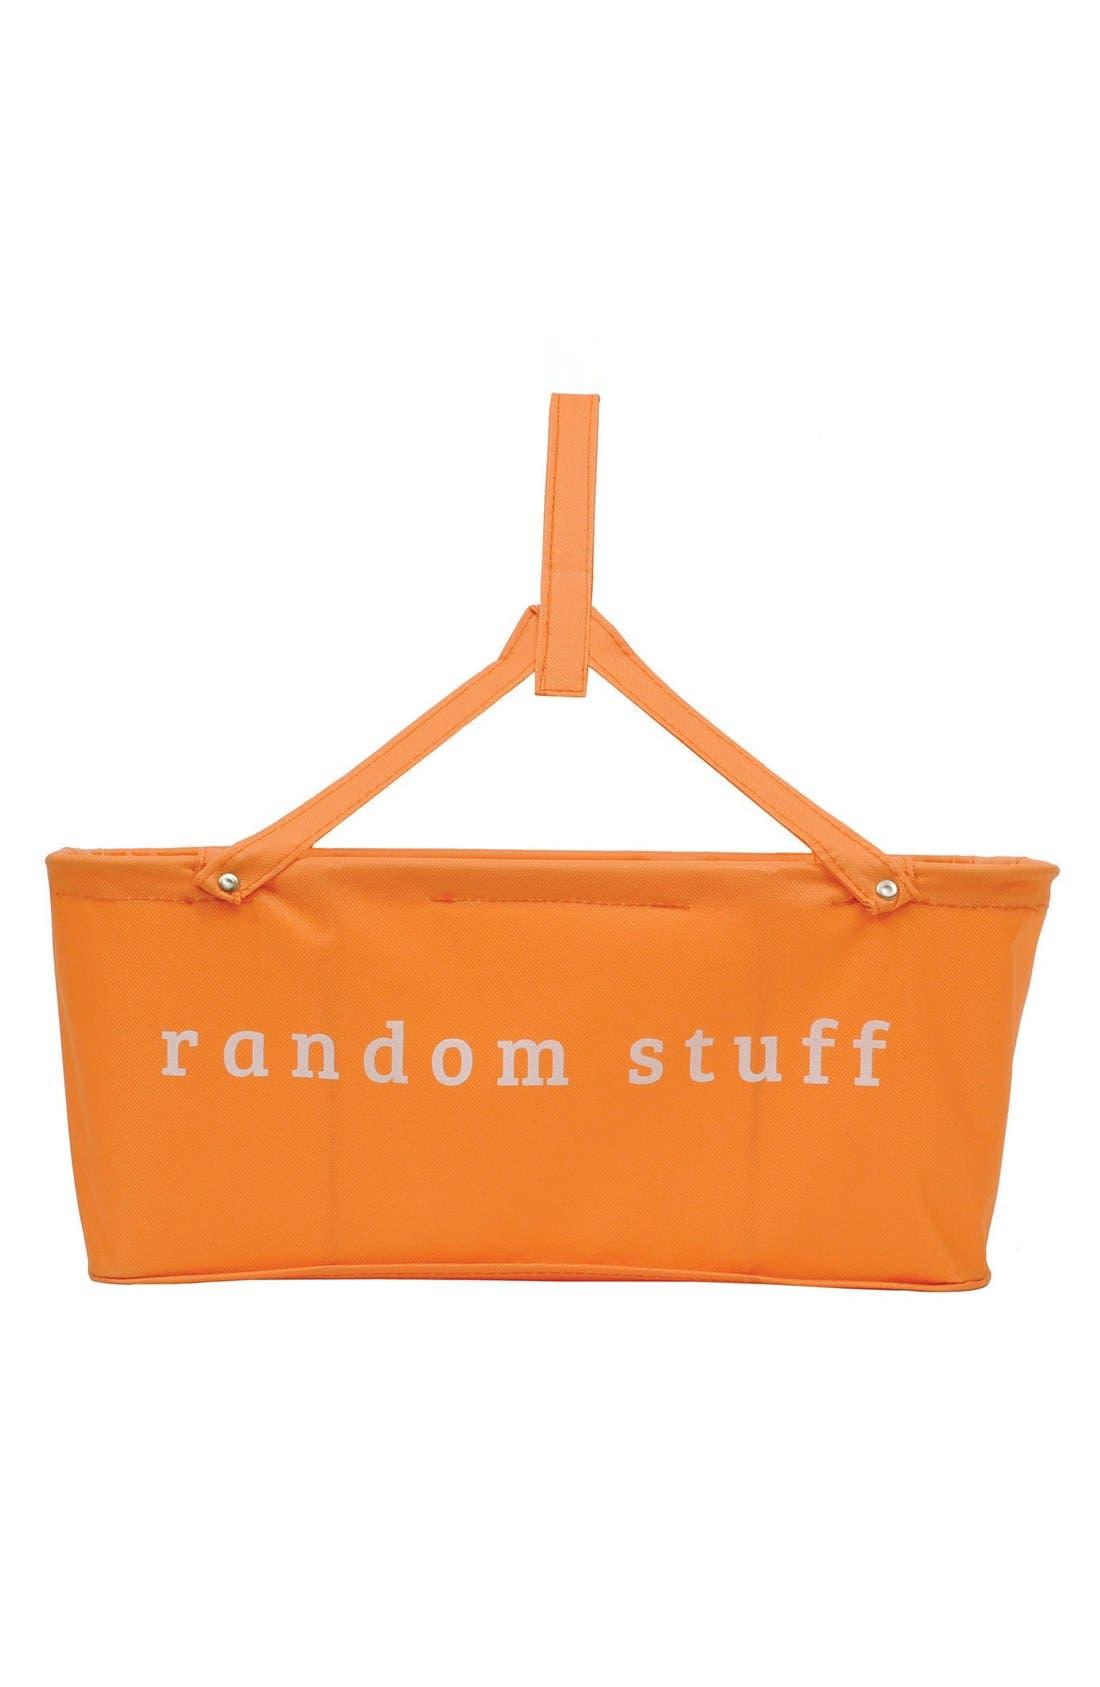 Main Image - Creative Co-Op 'Random Stuff' Canvas Basket